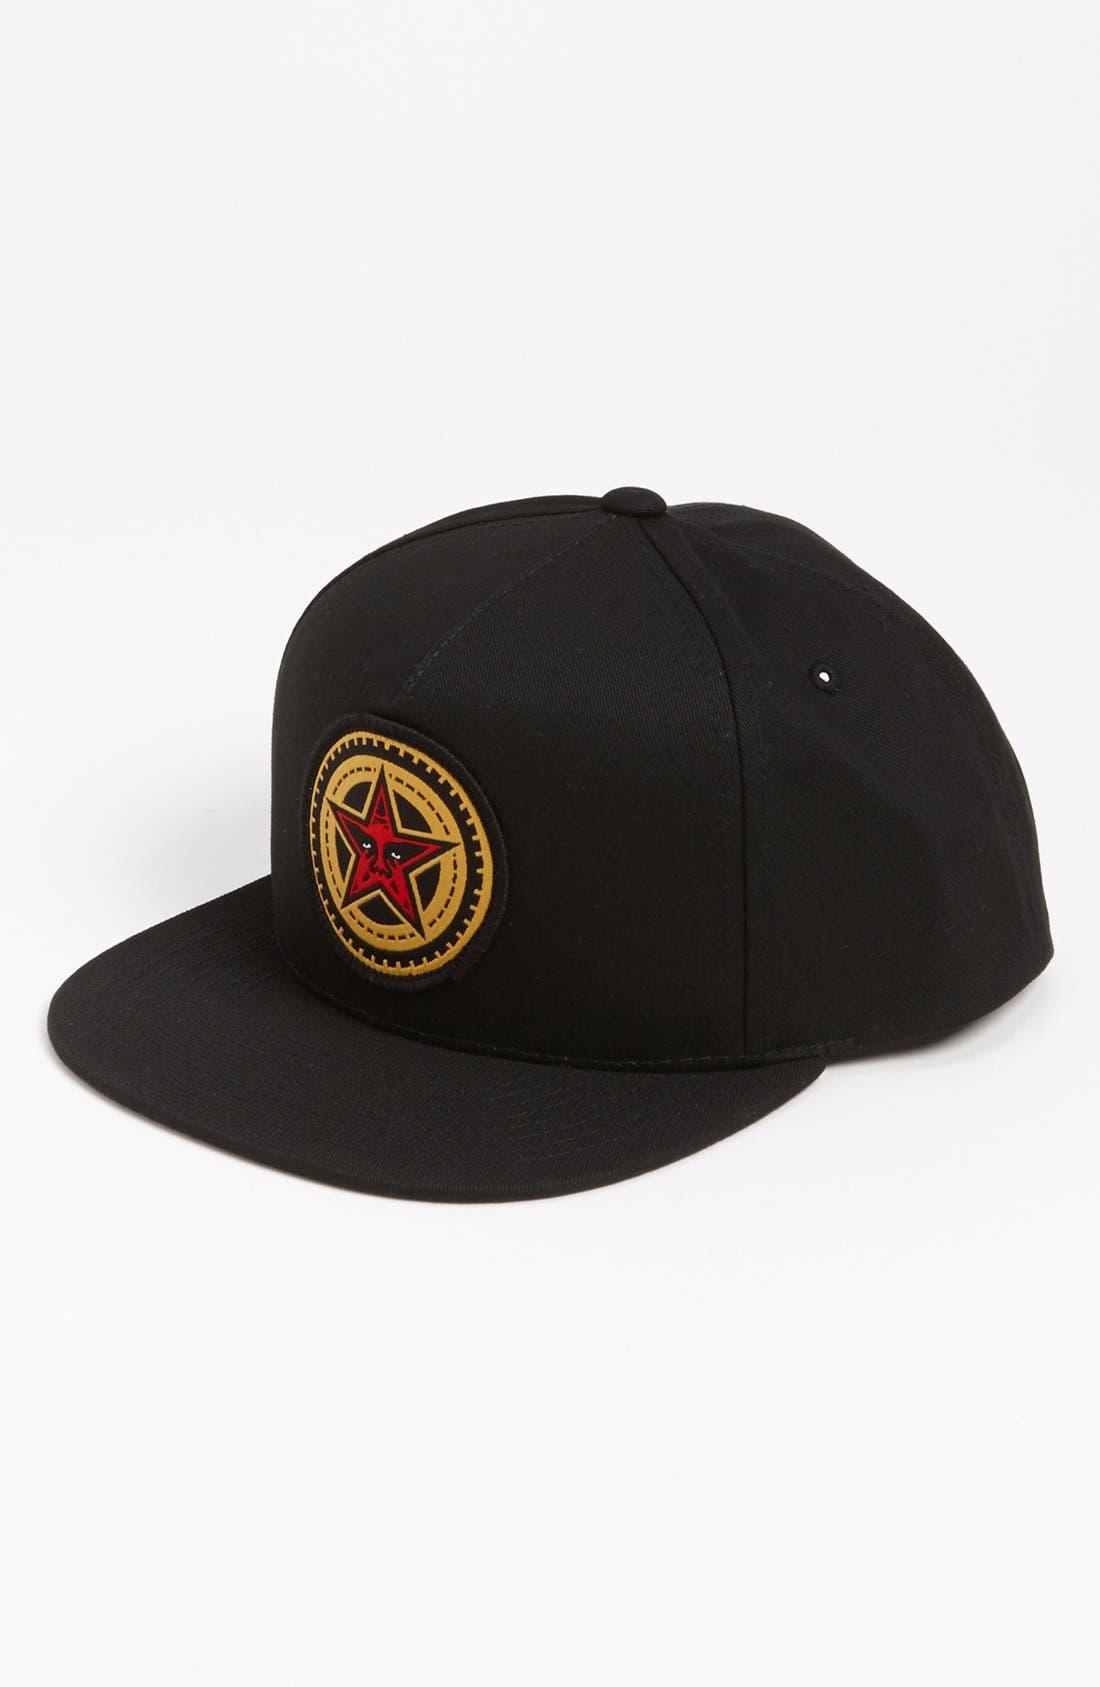 Main Image - Obey 'Gears' Snapback Hat